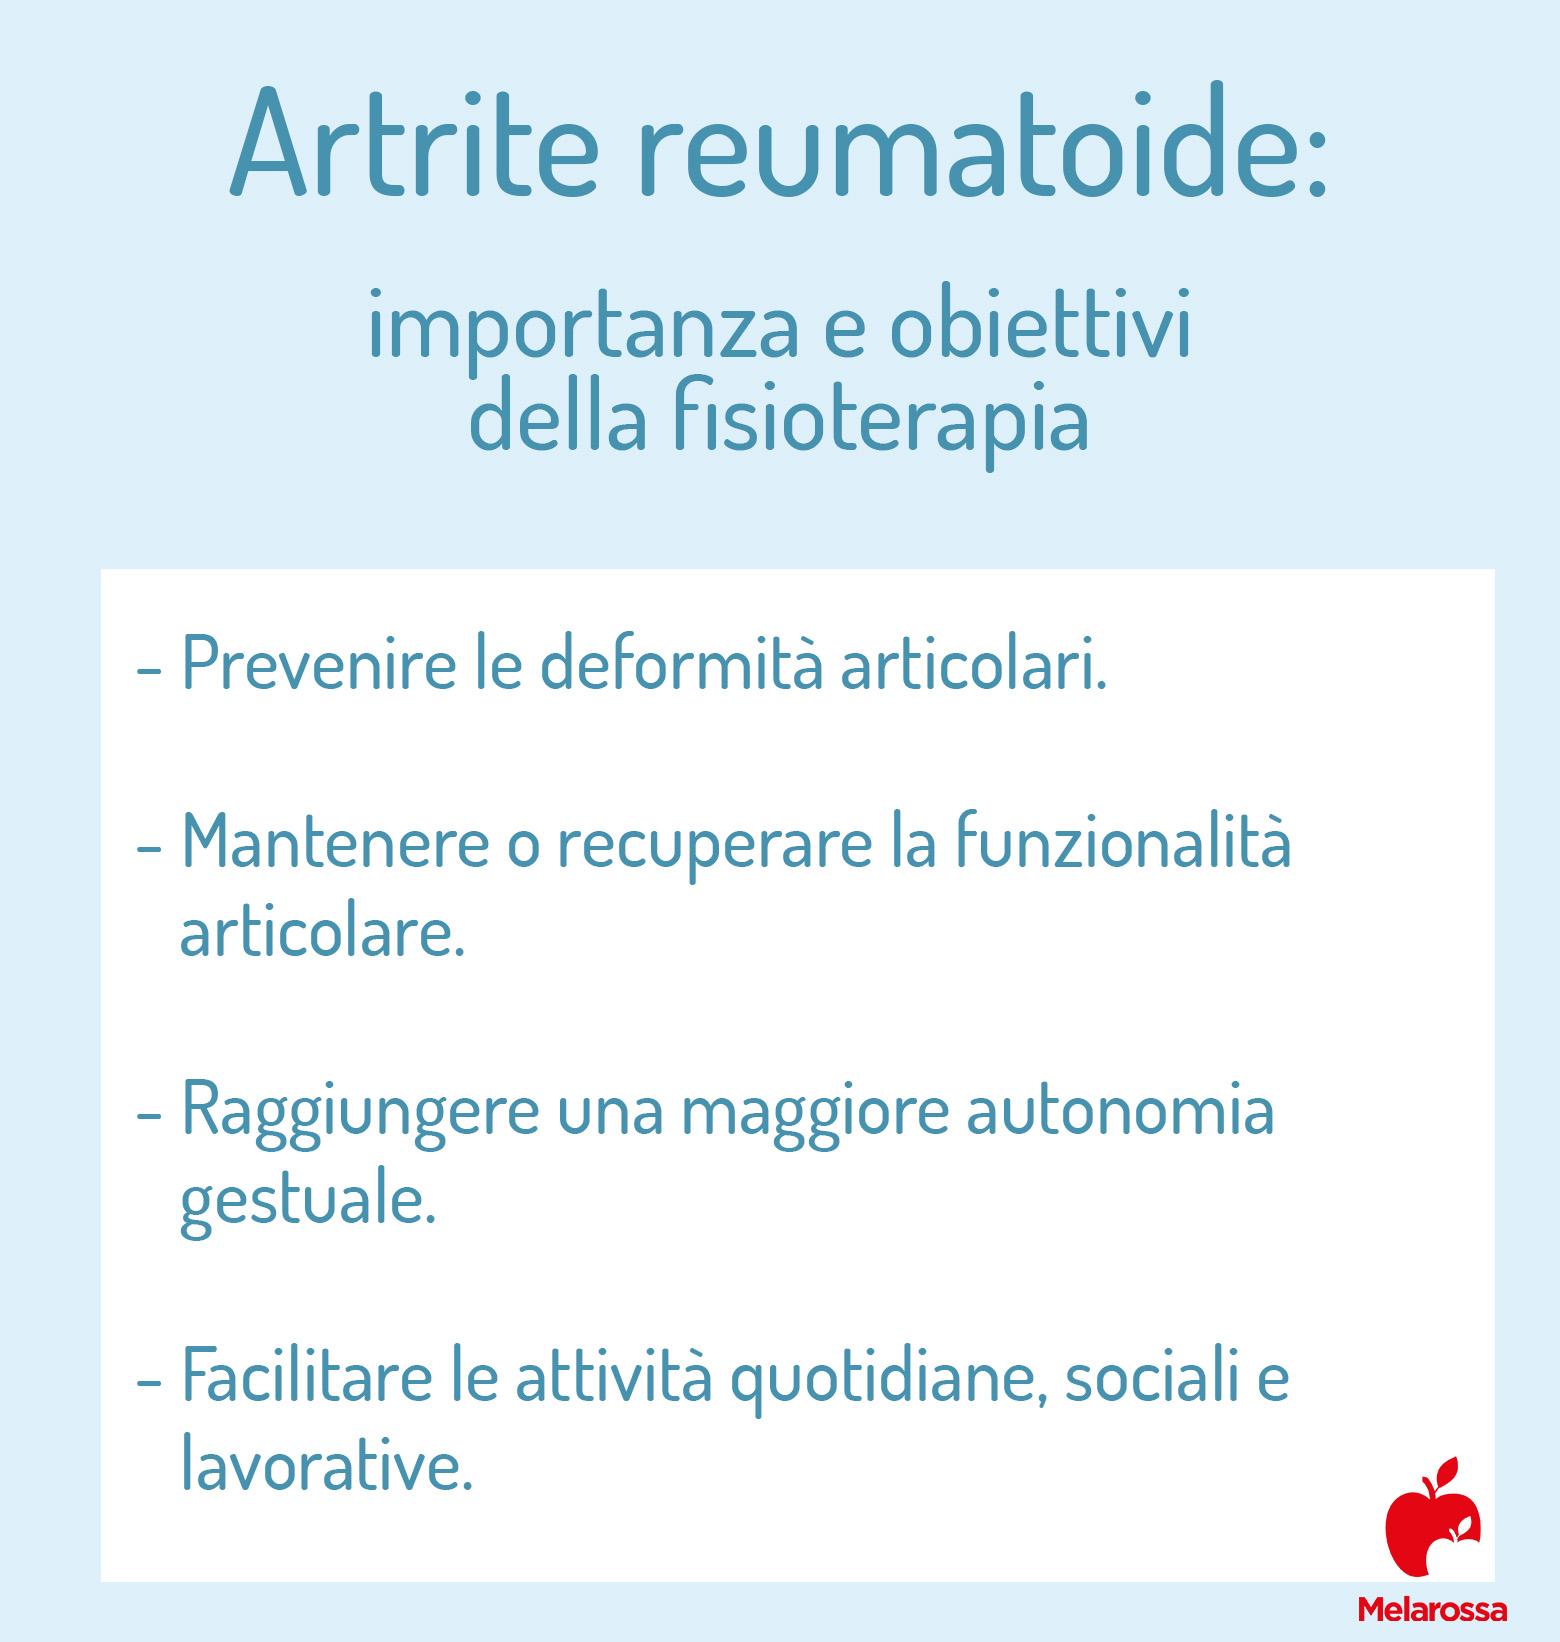 artrite reumatoide: fisoterapia